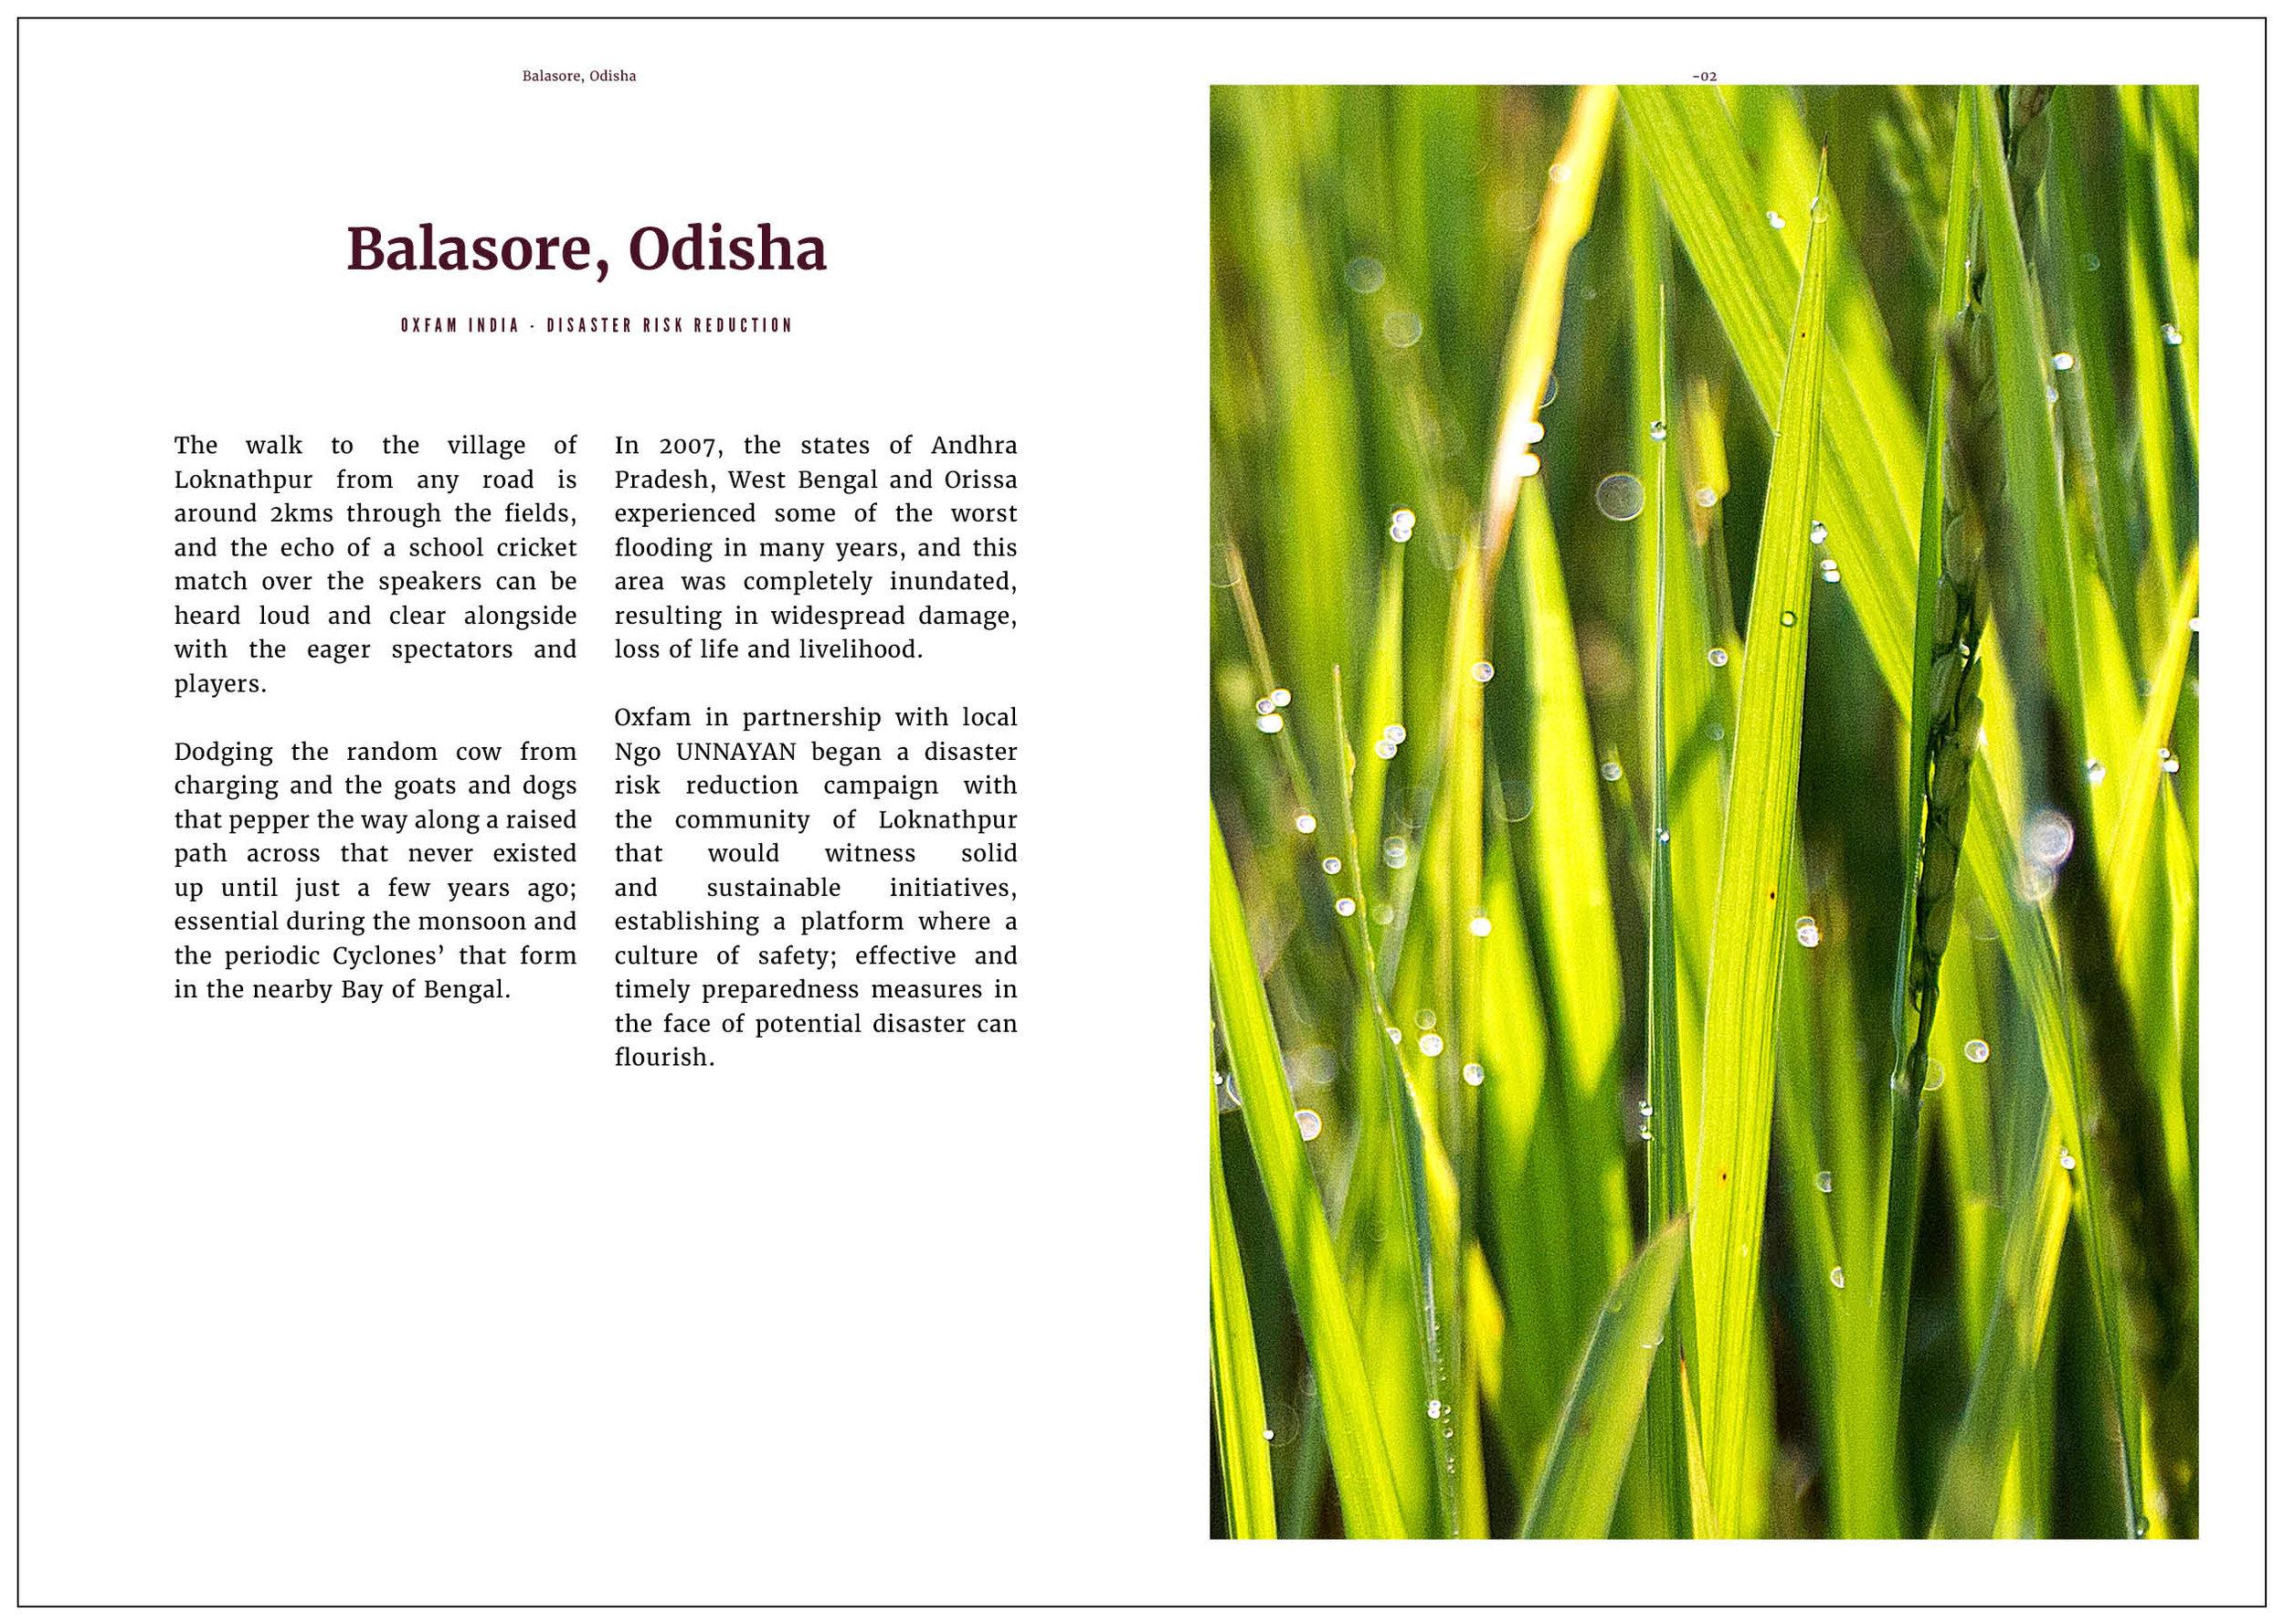 Balasore_0023.jpg